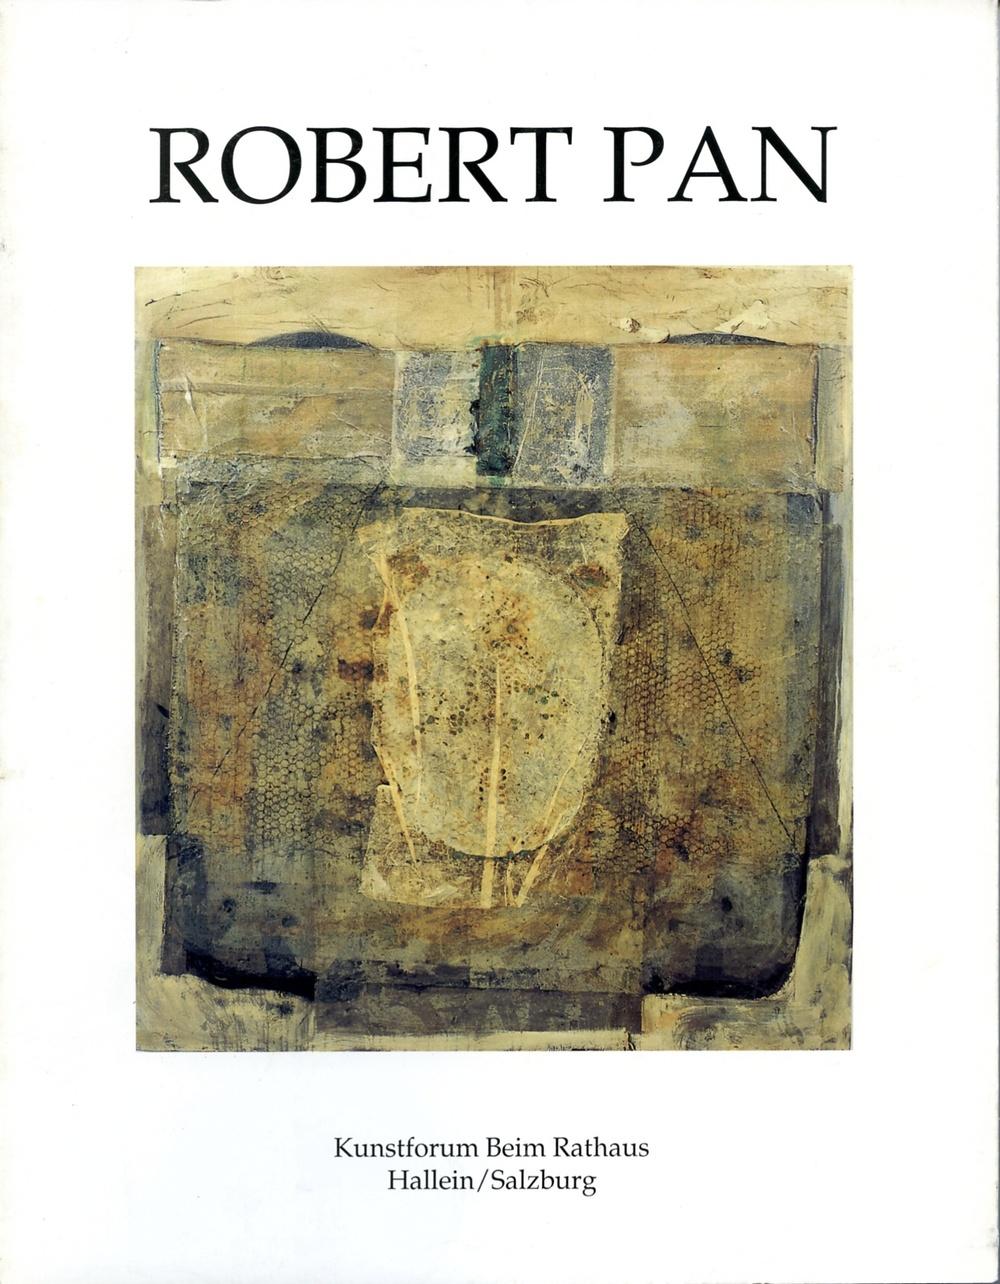 ROBERT PAN Kunstforum beim Rathaus 1992.jpg